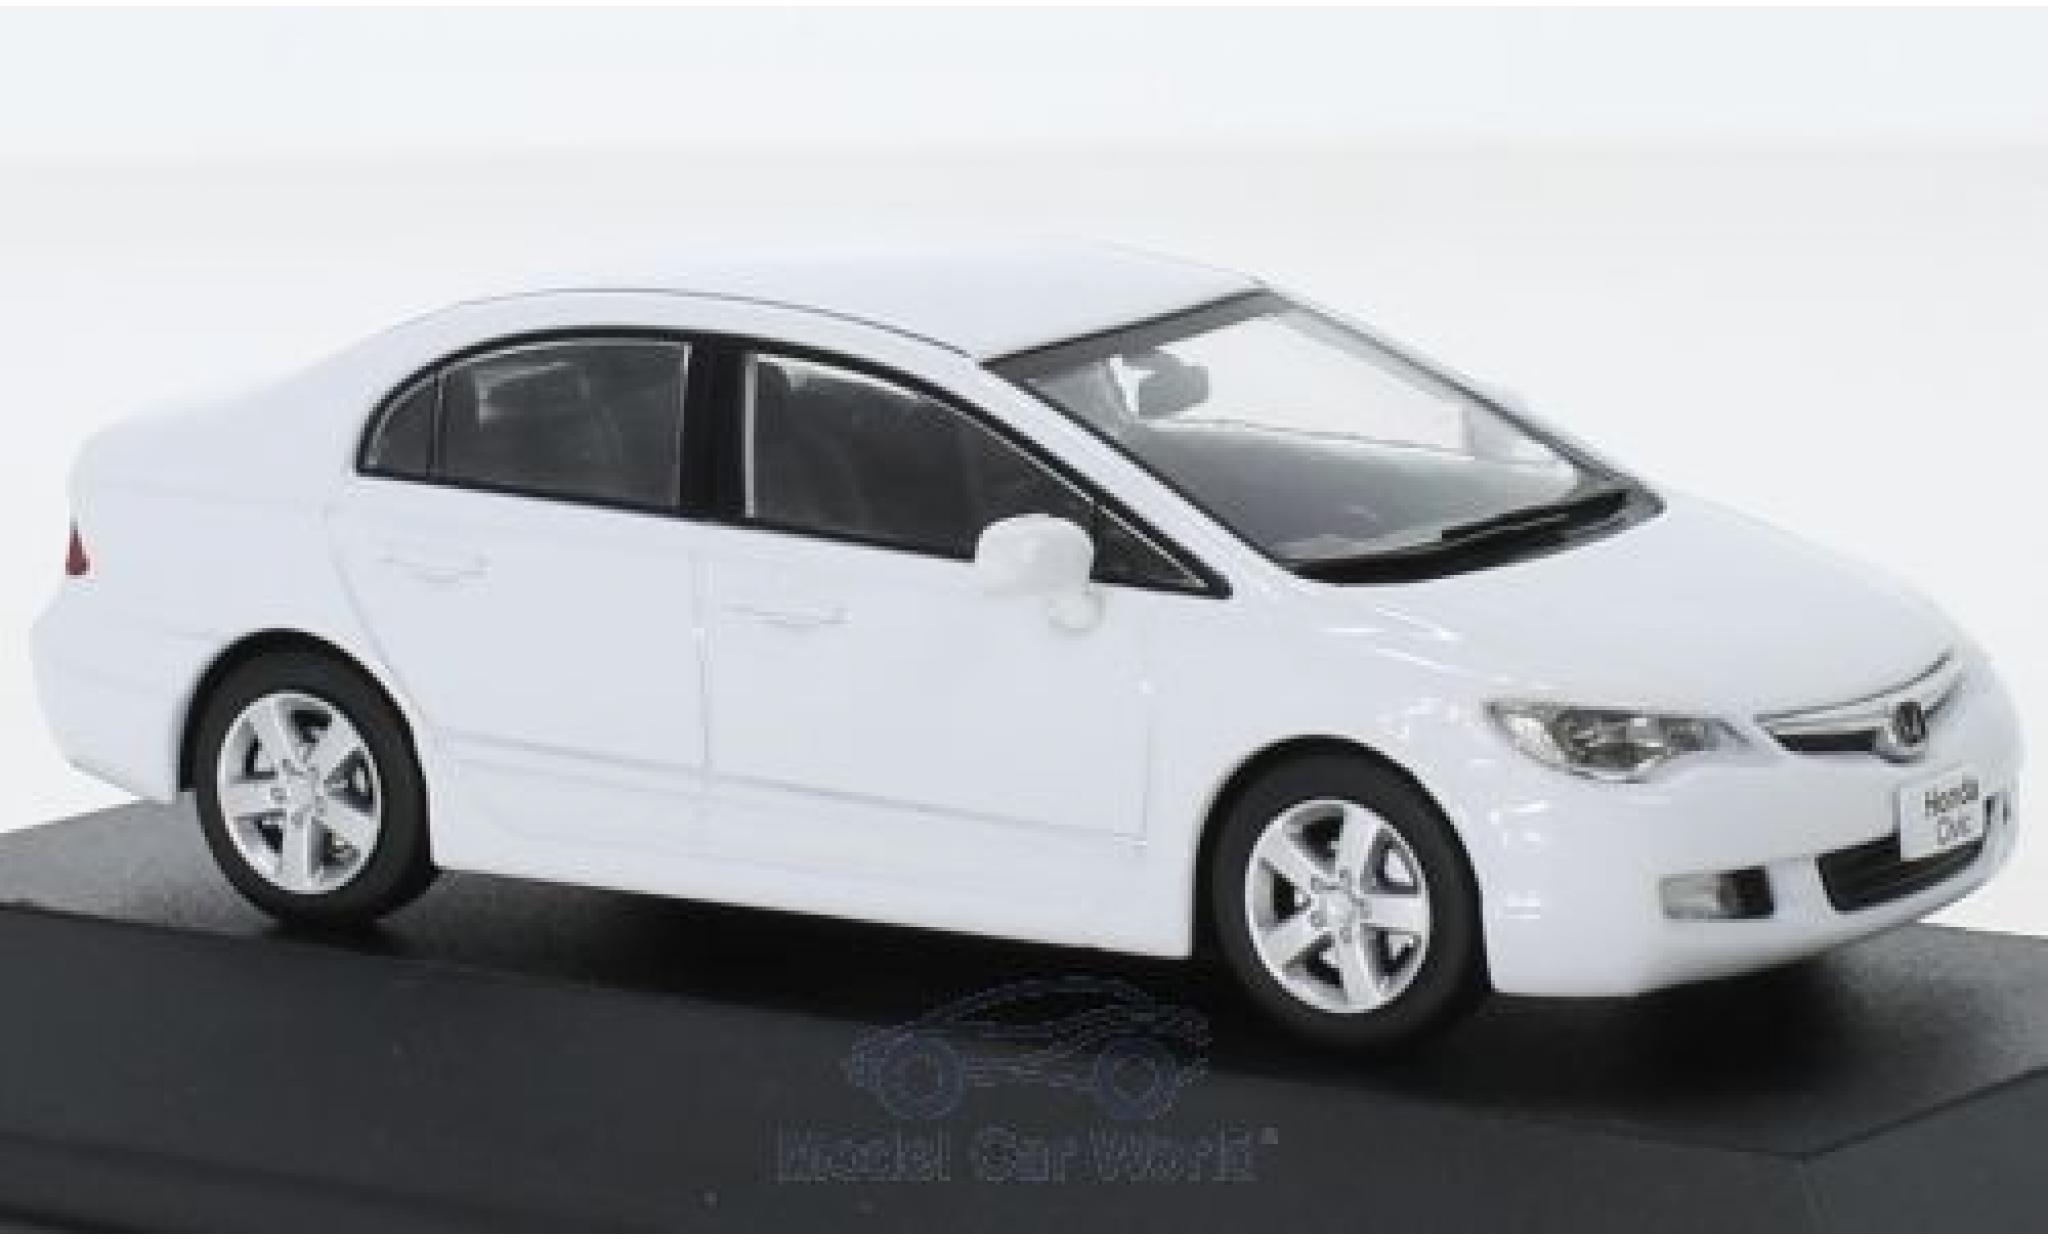 Honda Civic 1/43 First 43 Models white RHD 2006